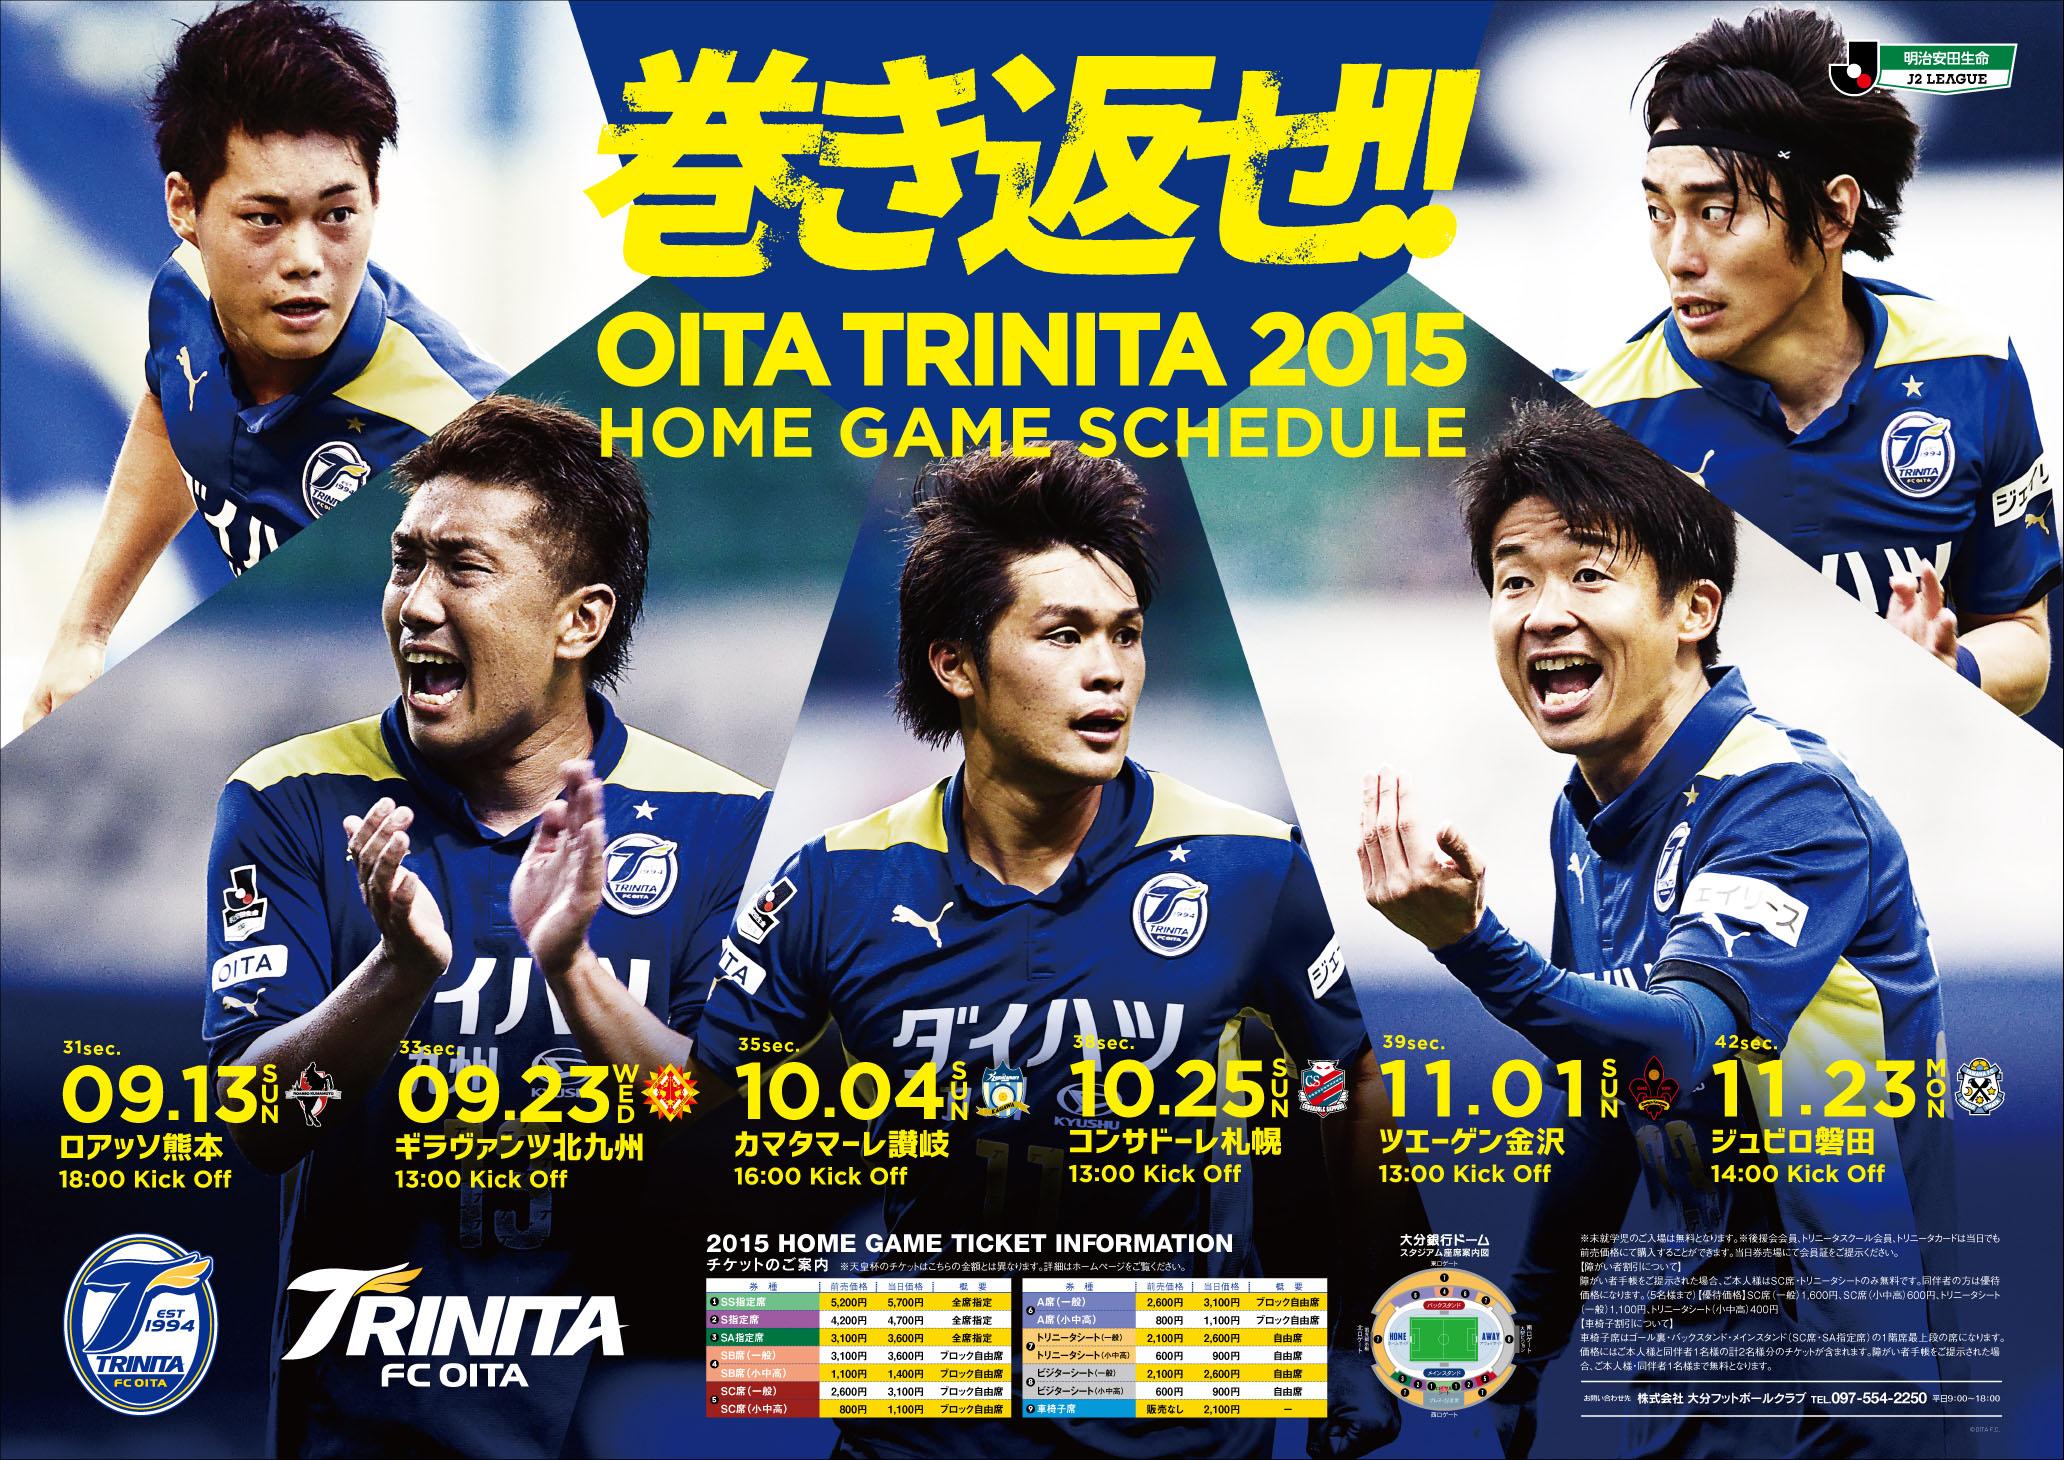 OITA TRINITA 2015後期試合日程ポスター